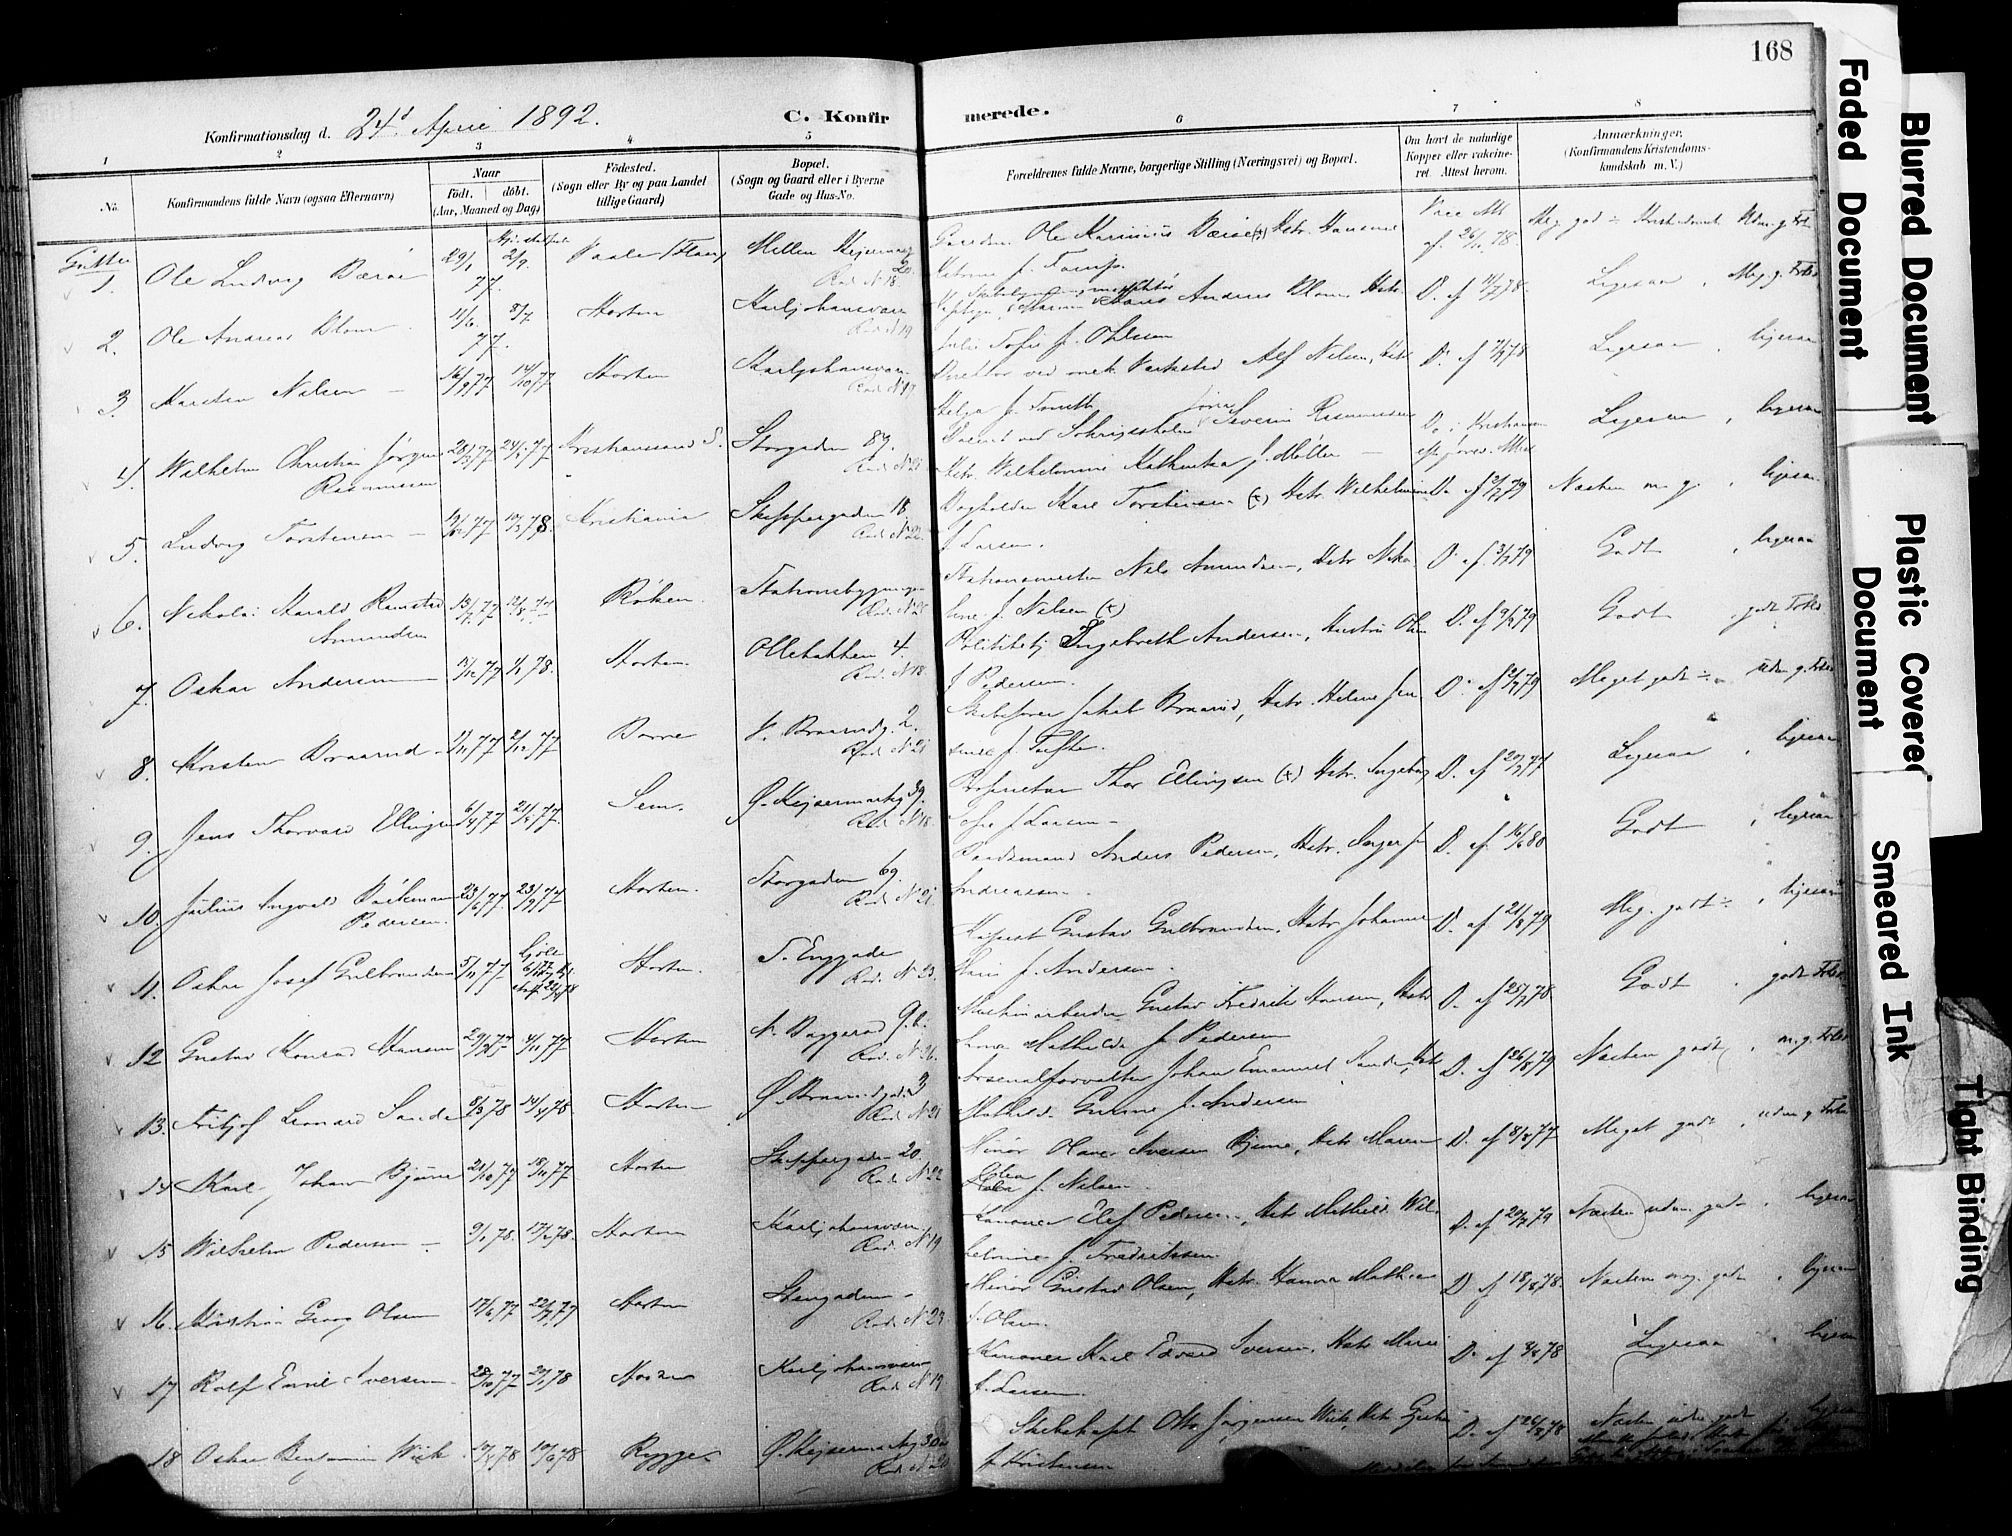 SAKO, Horten kirkebøker, F/Fa/L0004: Parish register (official) no. 4, 1888-1895, p. 168